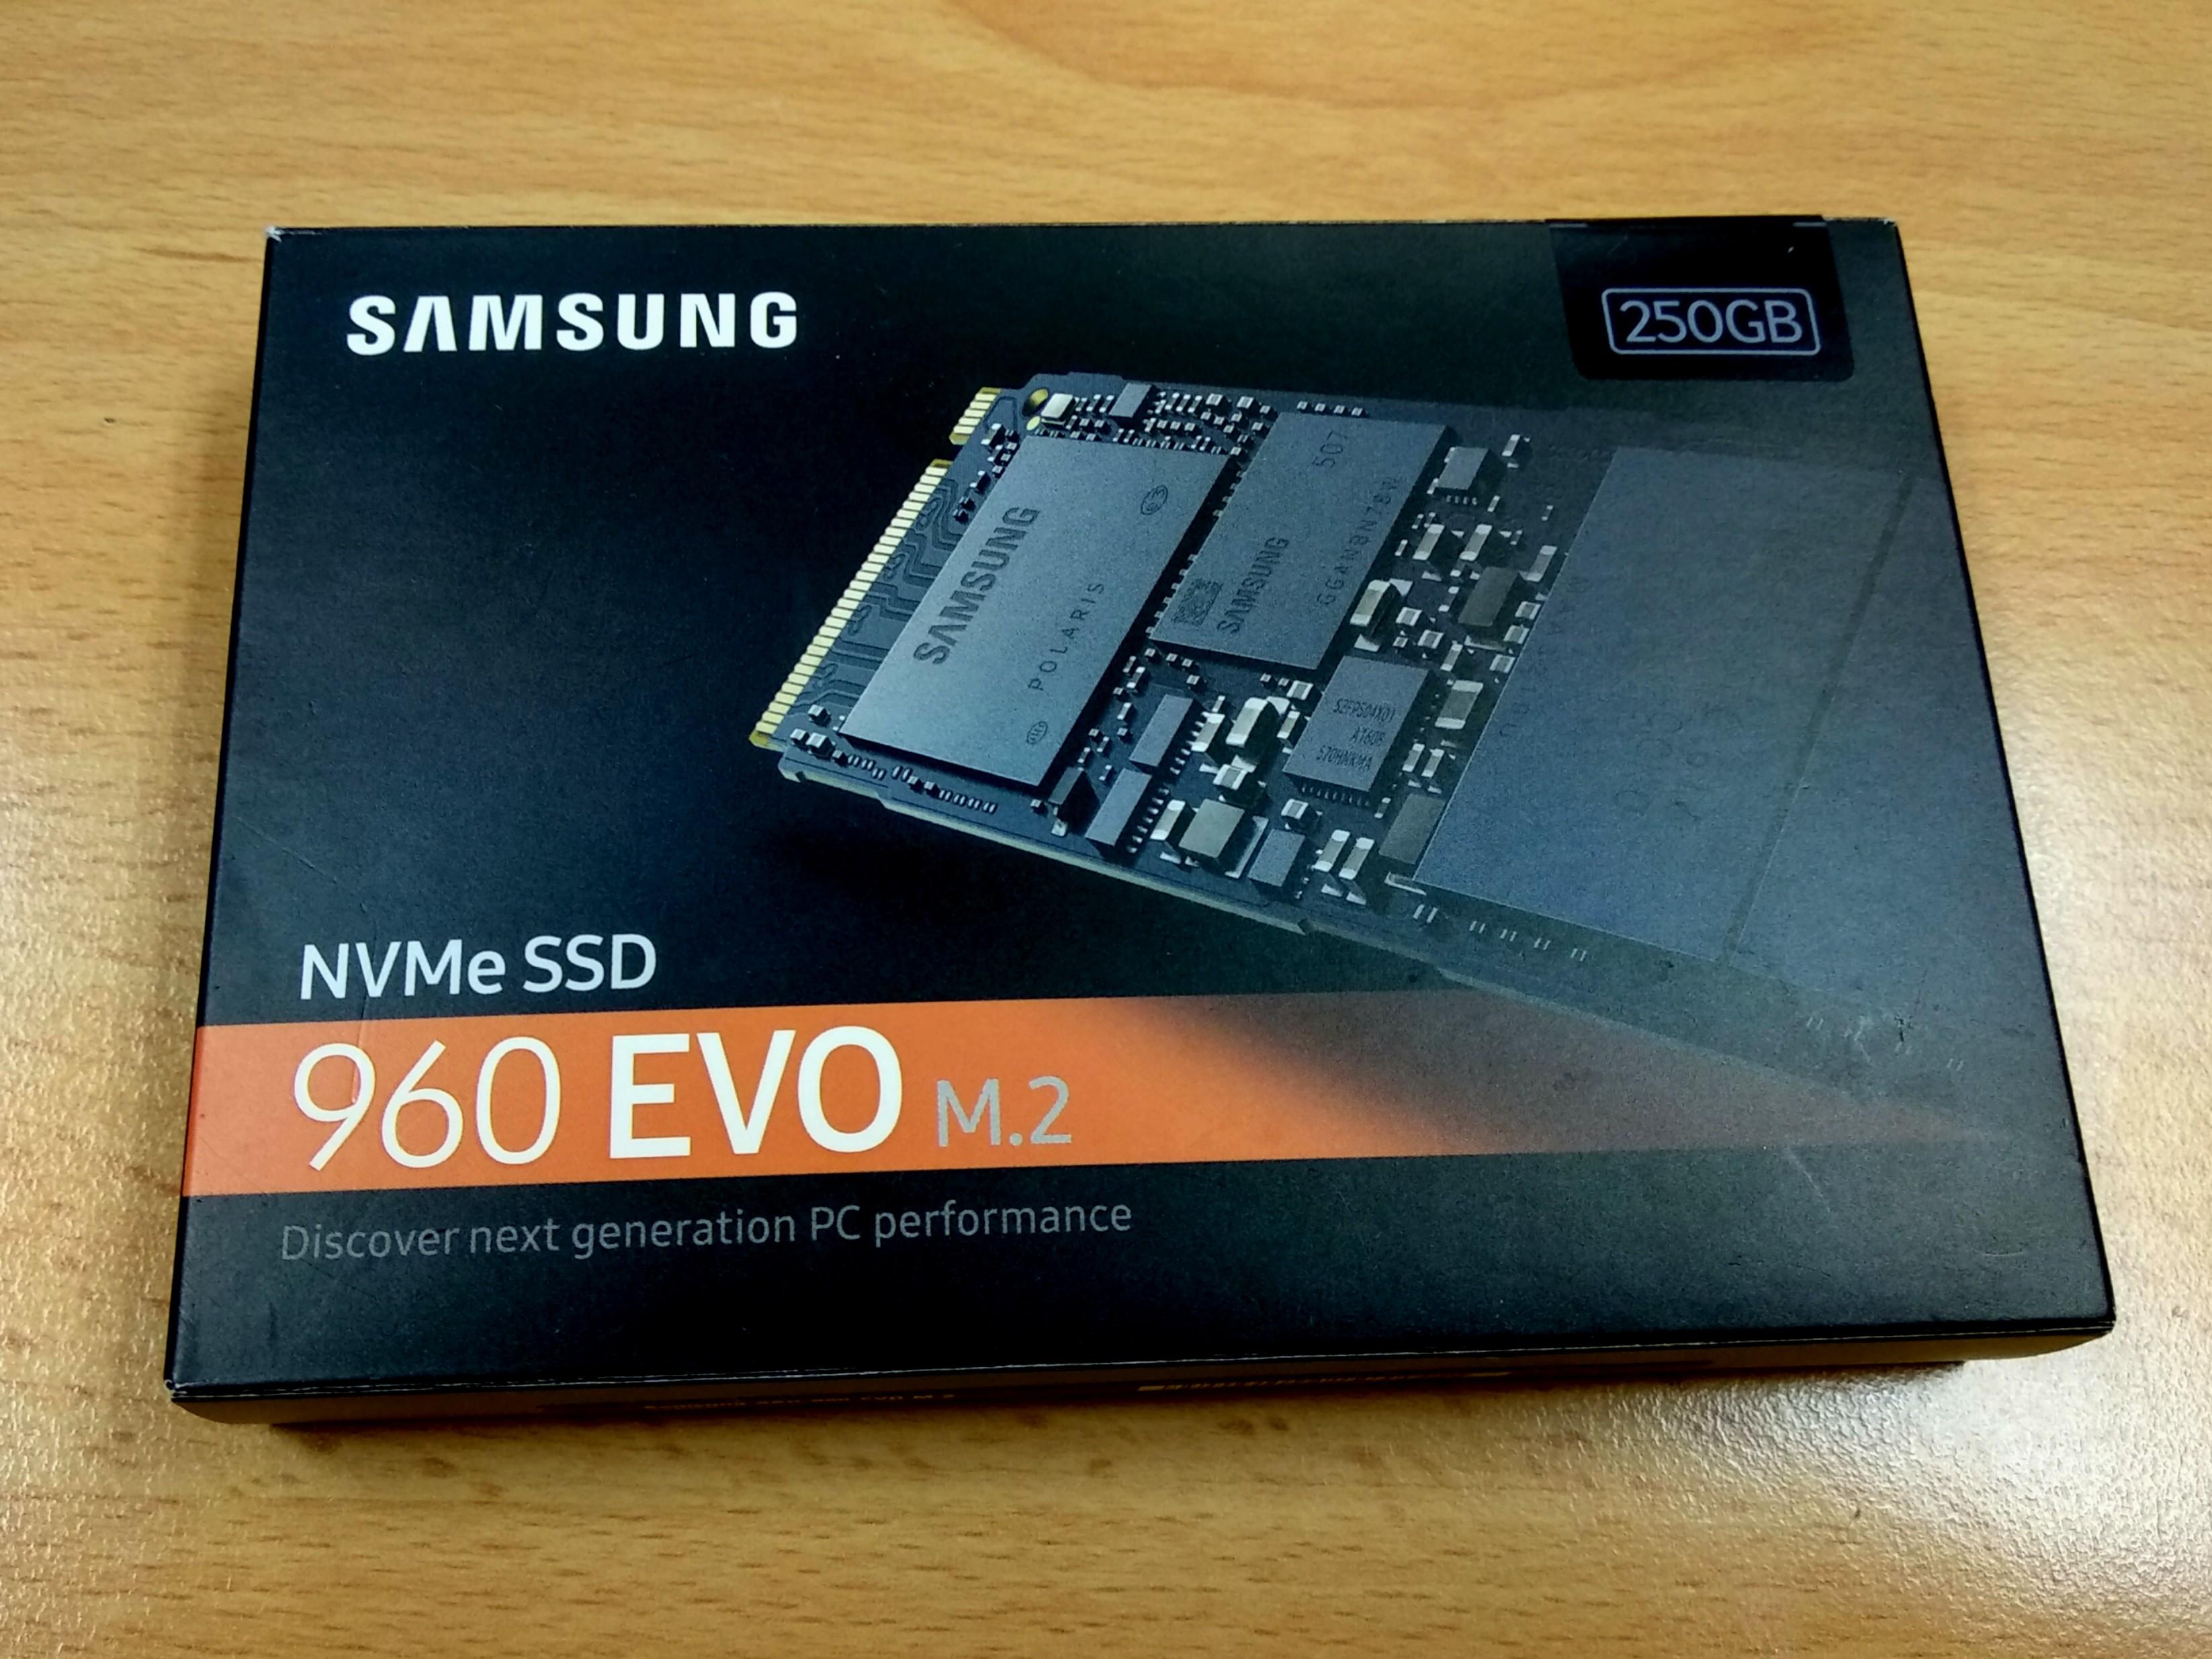 Samsung 960 Evo M2 Nvme Ssd 250gb Electronics Computers On Carousell